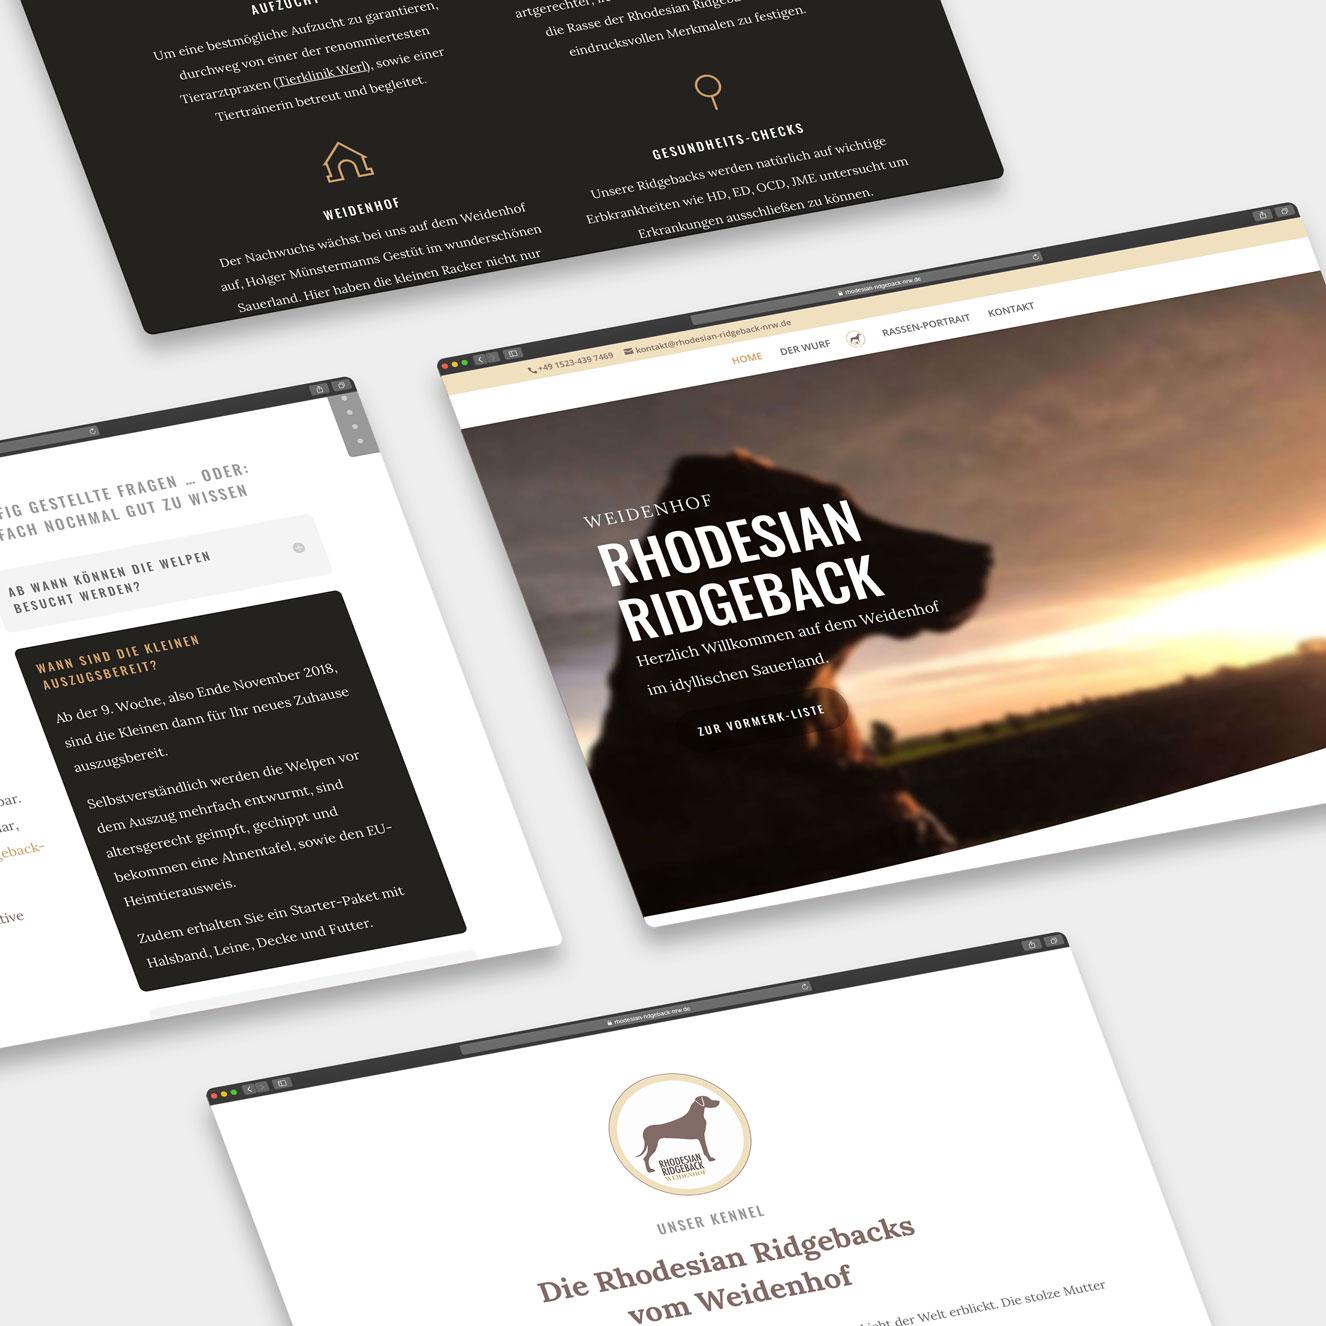 1313 multimedial Grafikdesign Webdesign Sauerland Arnsberg rr